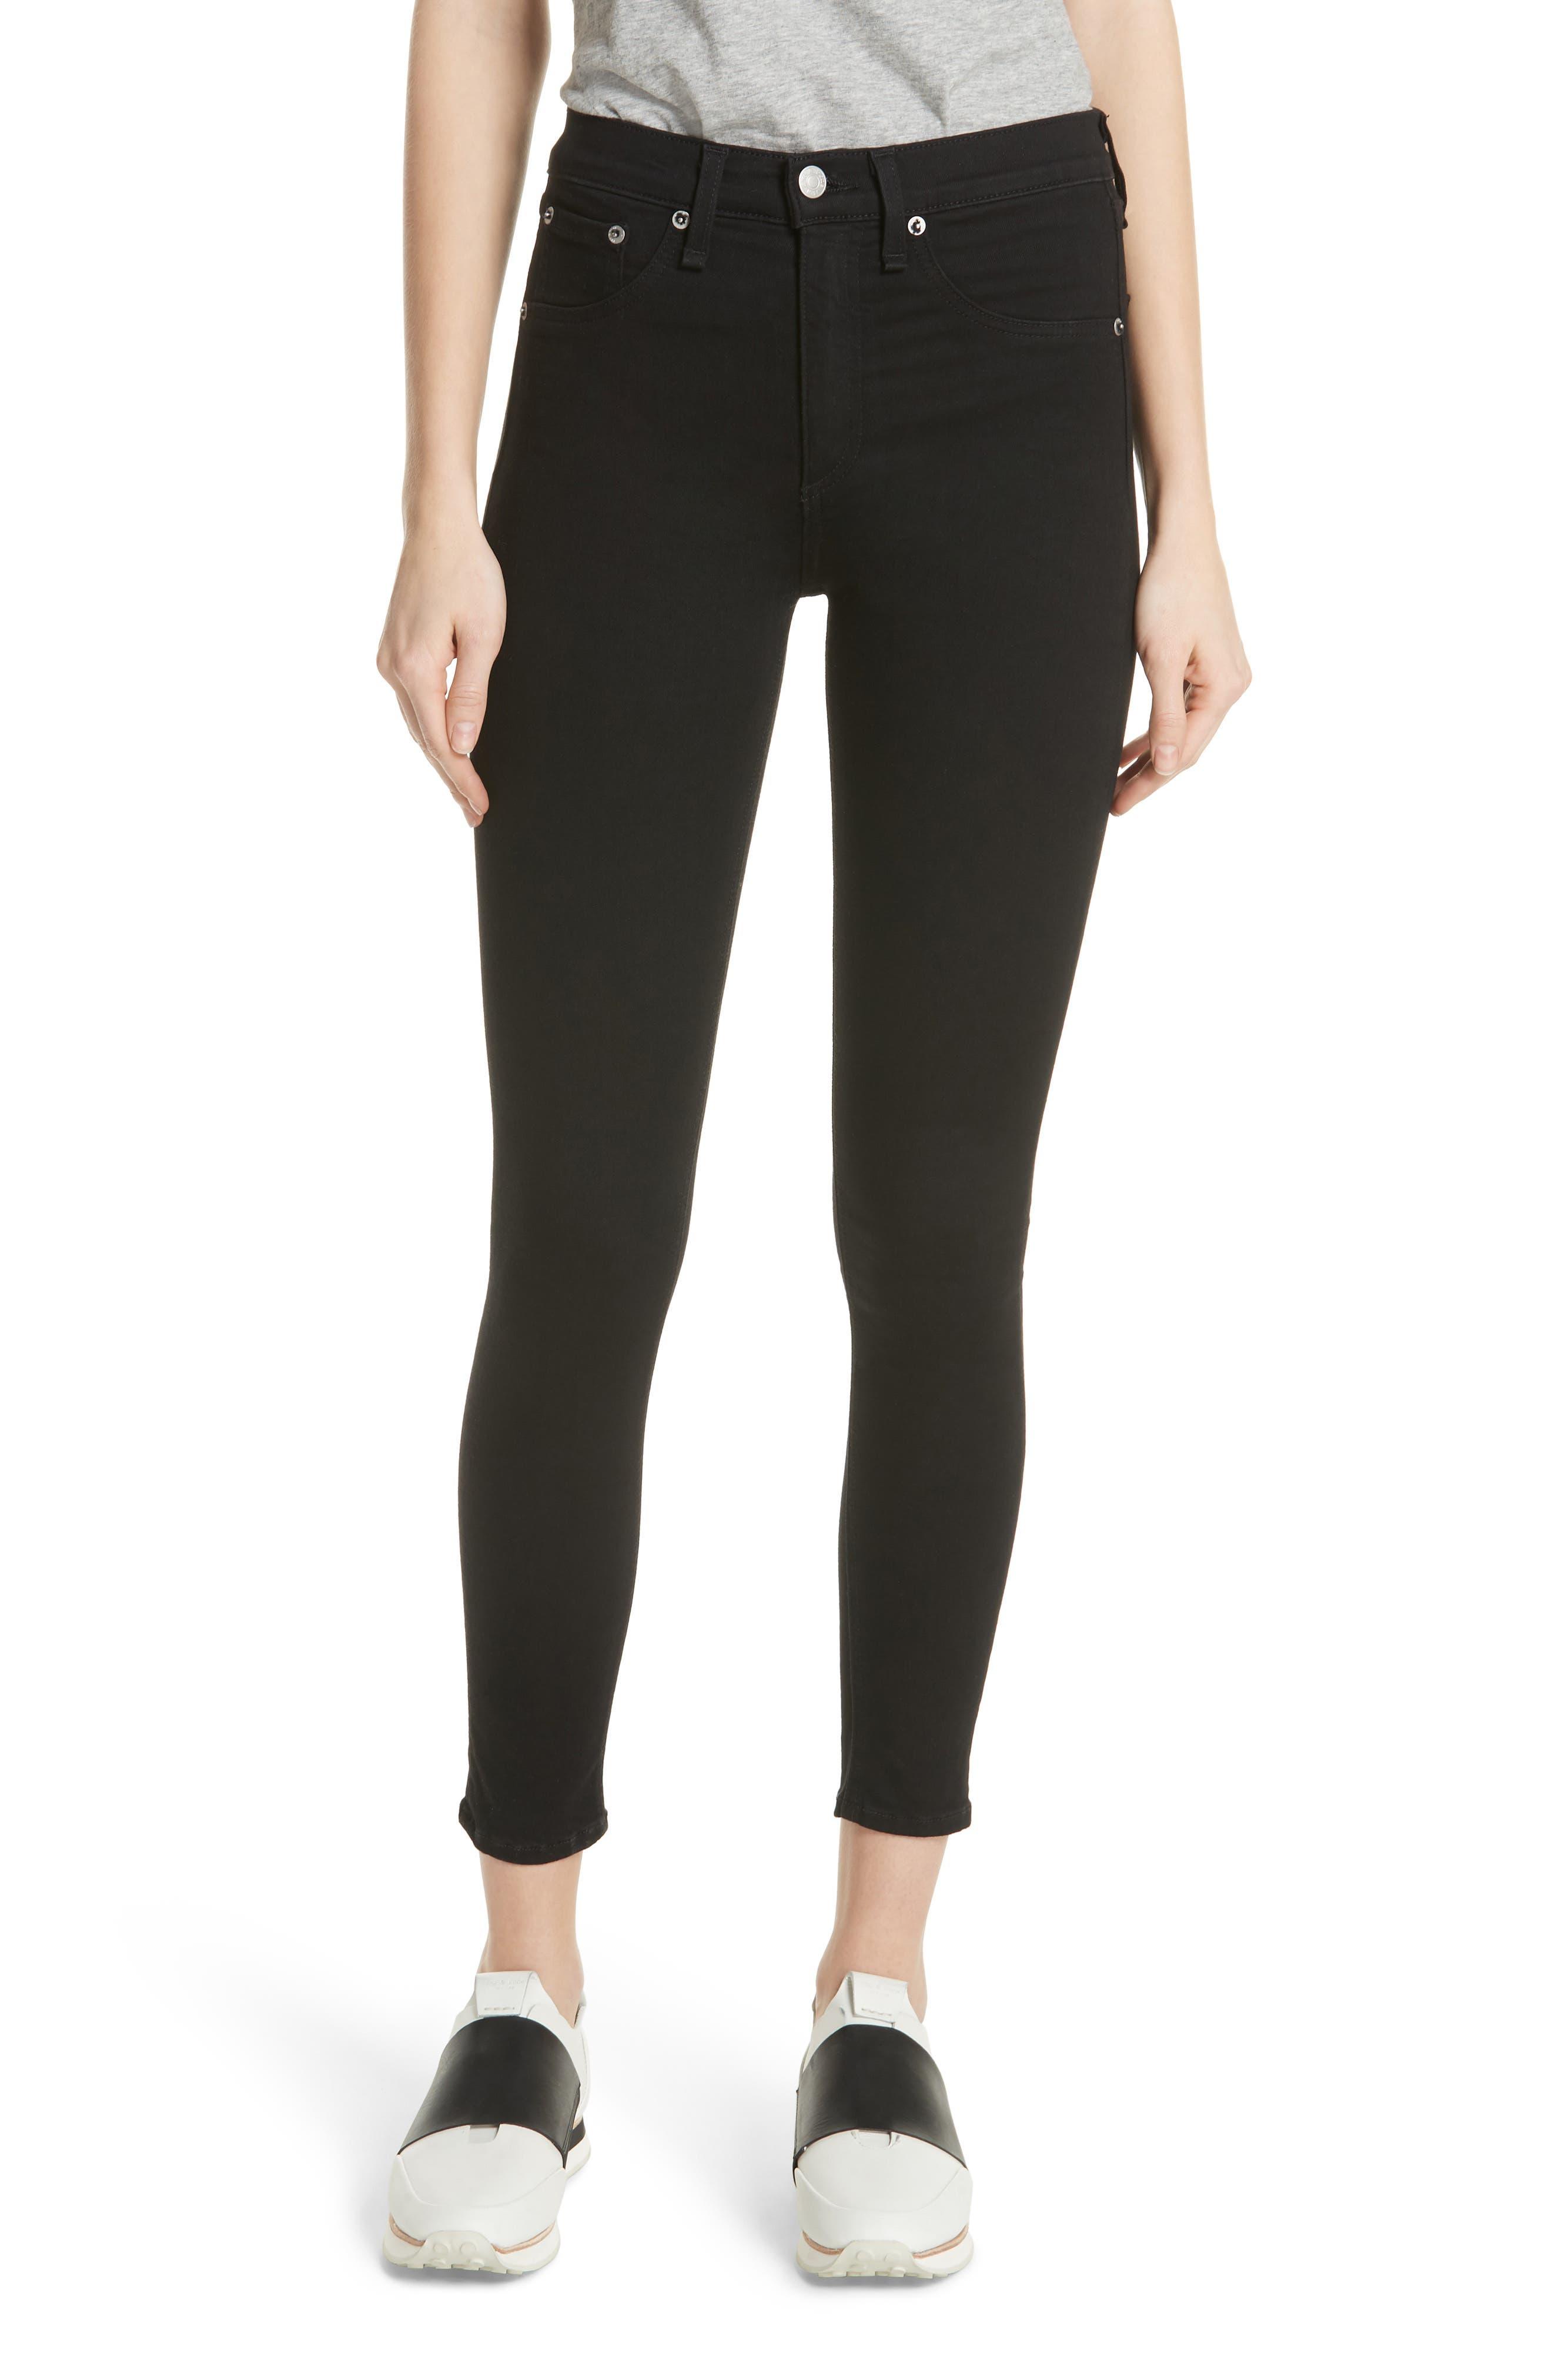 RAG & BONE, High Waist Ankle Skinny Jeans, Main thumbnail 1, color, BLACK